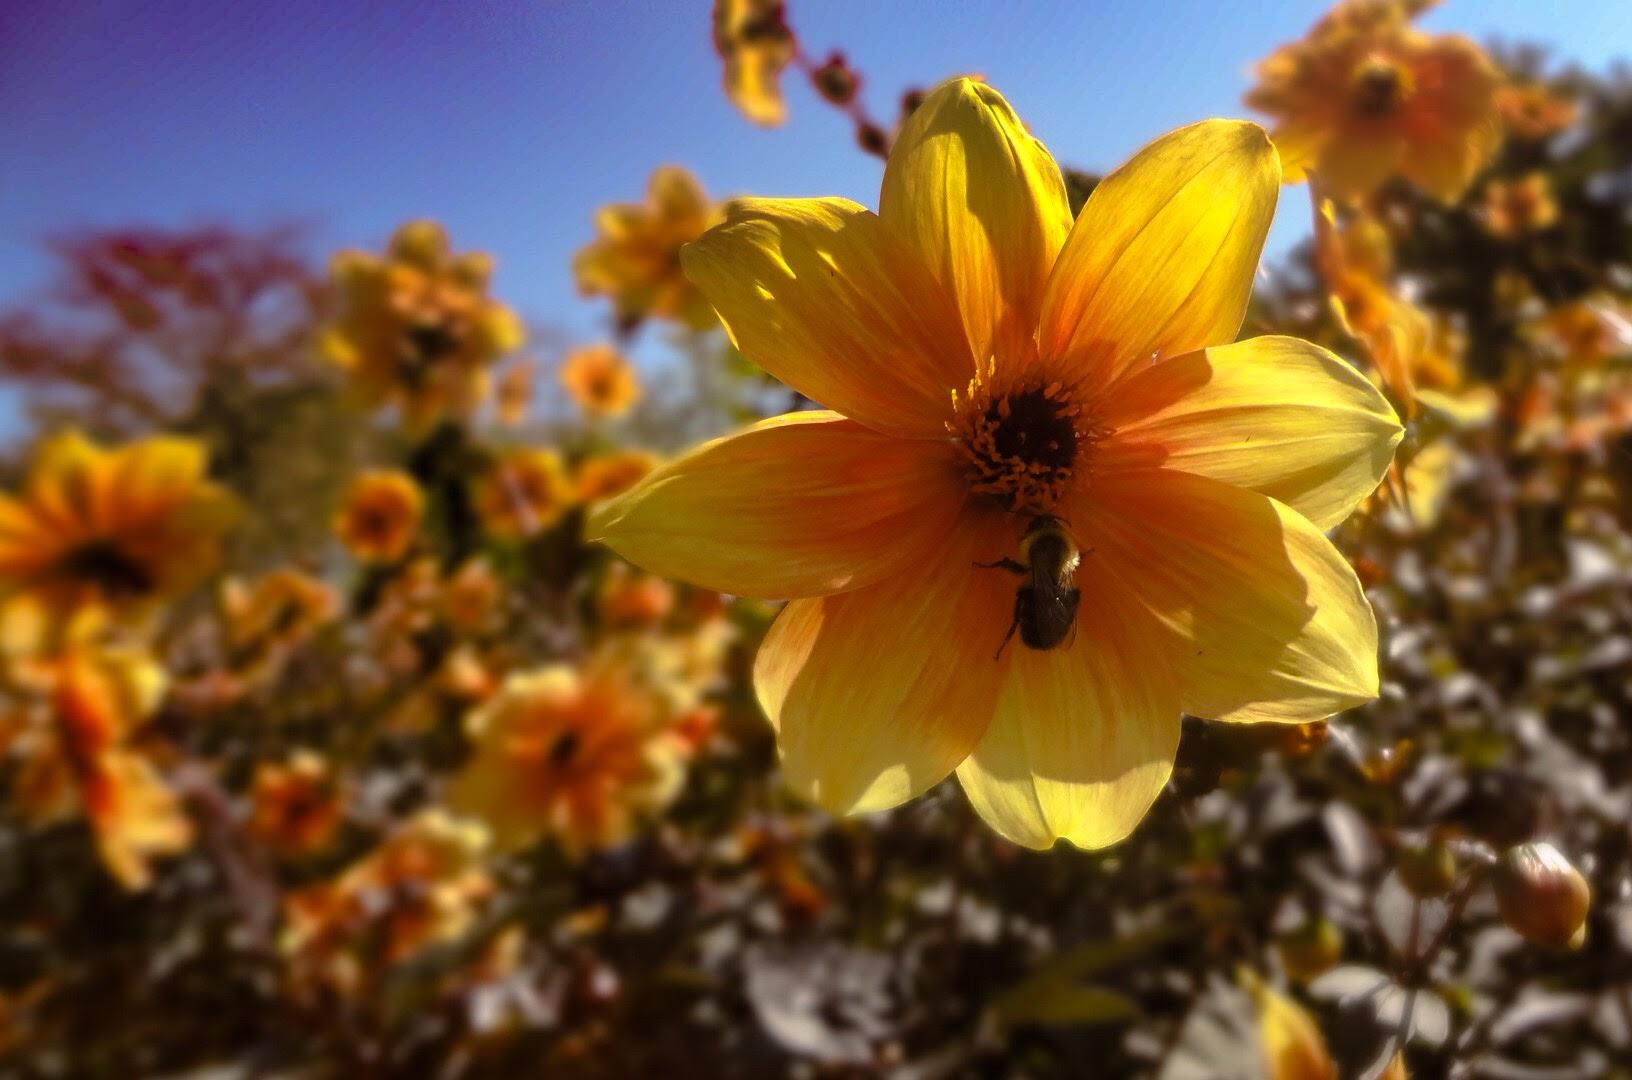 File:Bee on Flower at Longwood Gardens.jpg - Wikimedia Commons